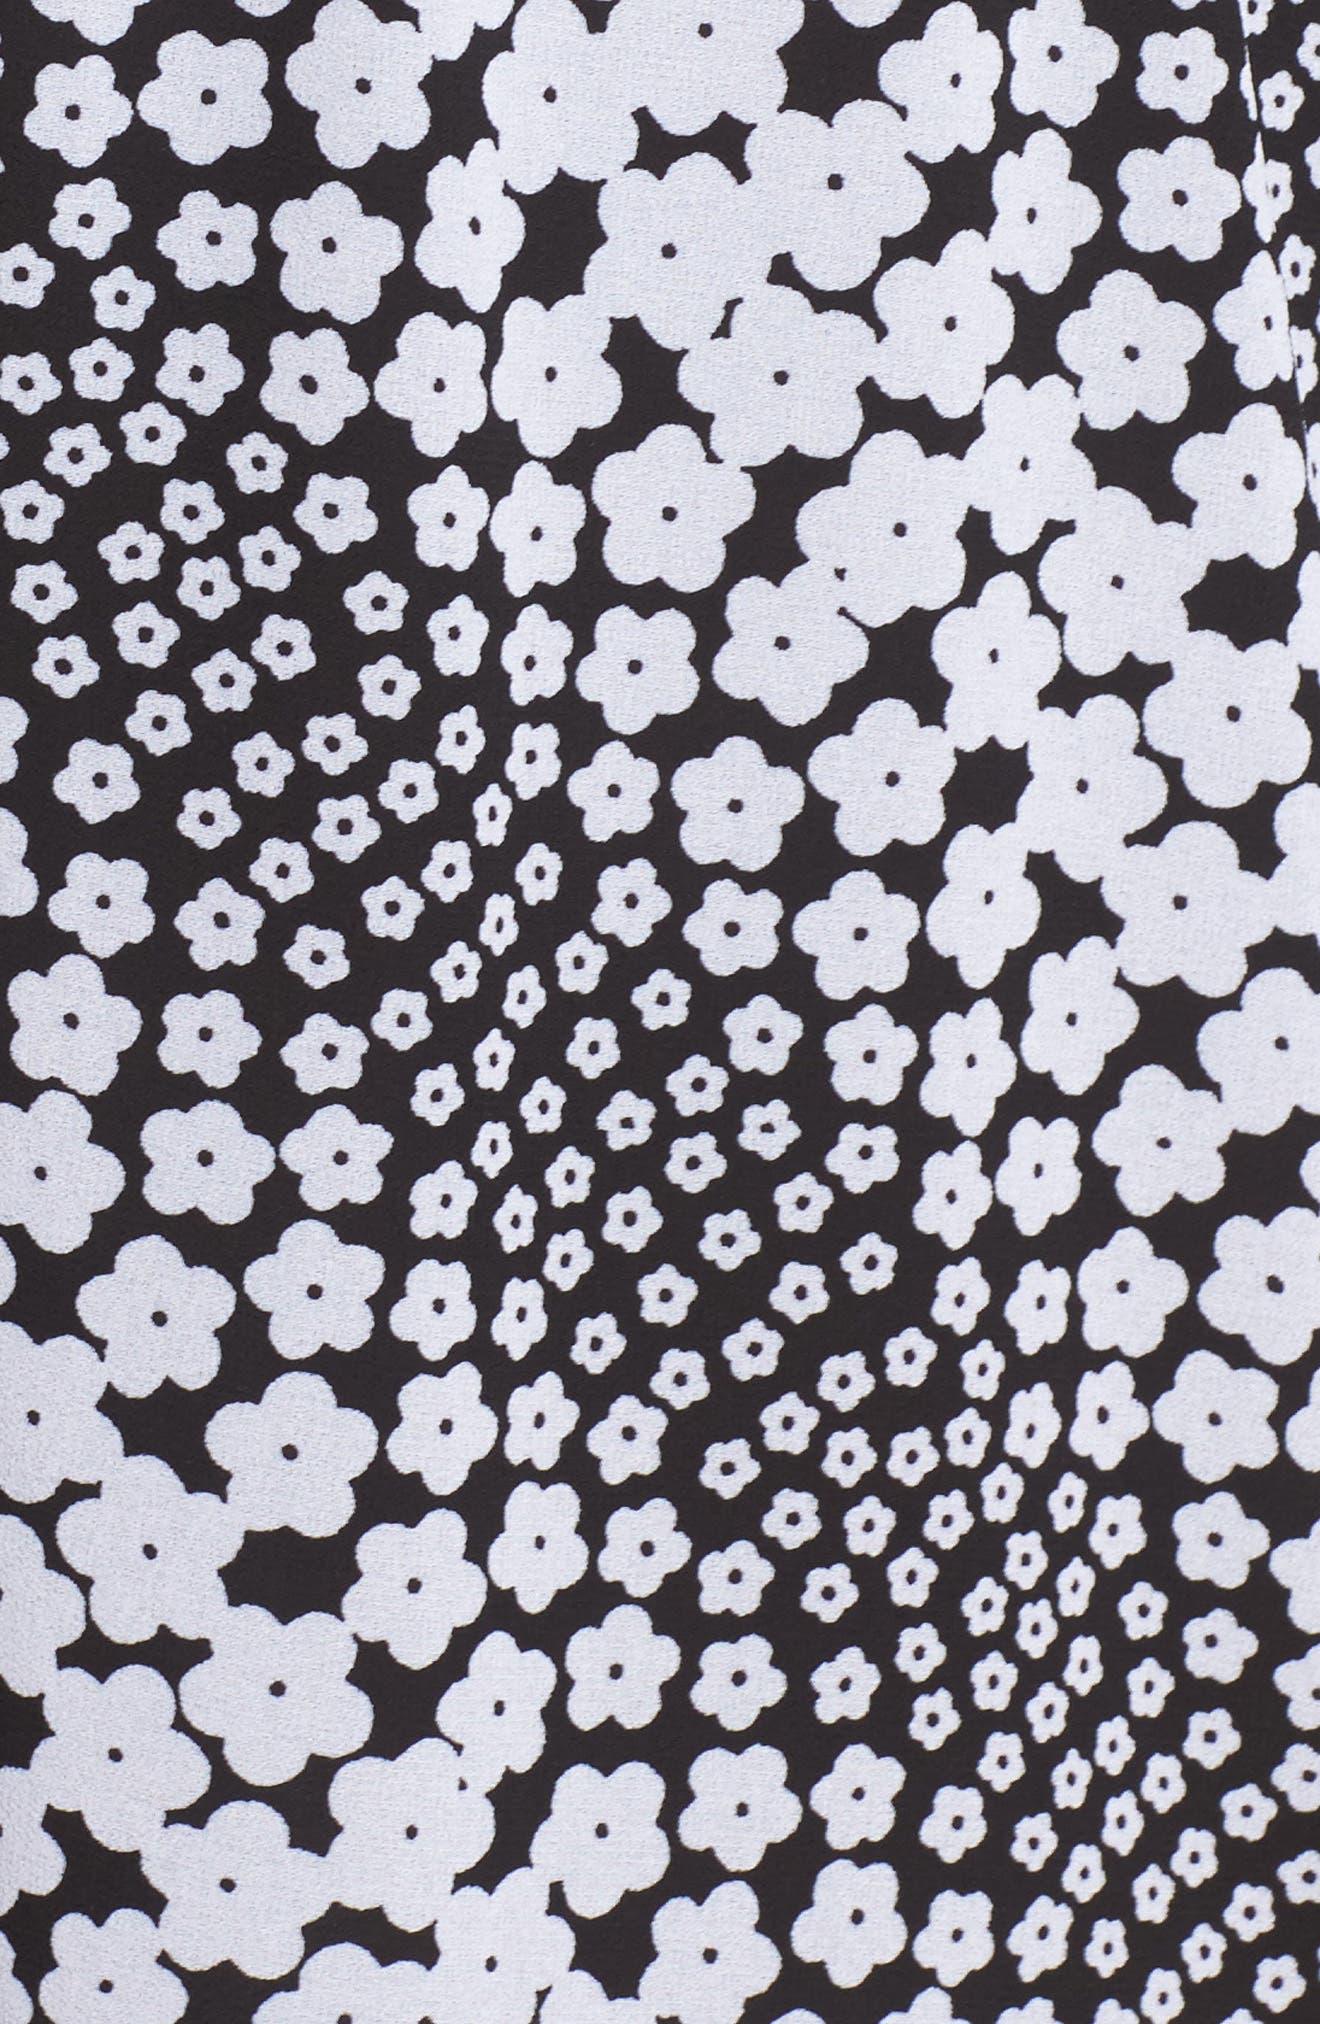 Cold Shoulder Blouson Dress,                             Alternate thumbnail 5, color,                             Black/ White